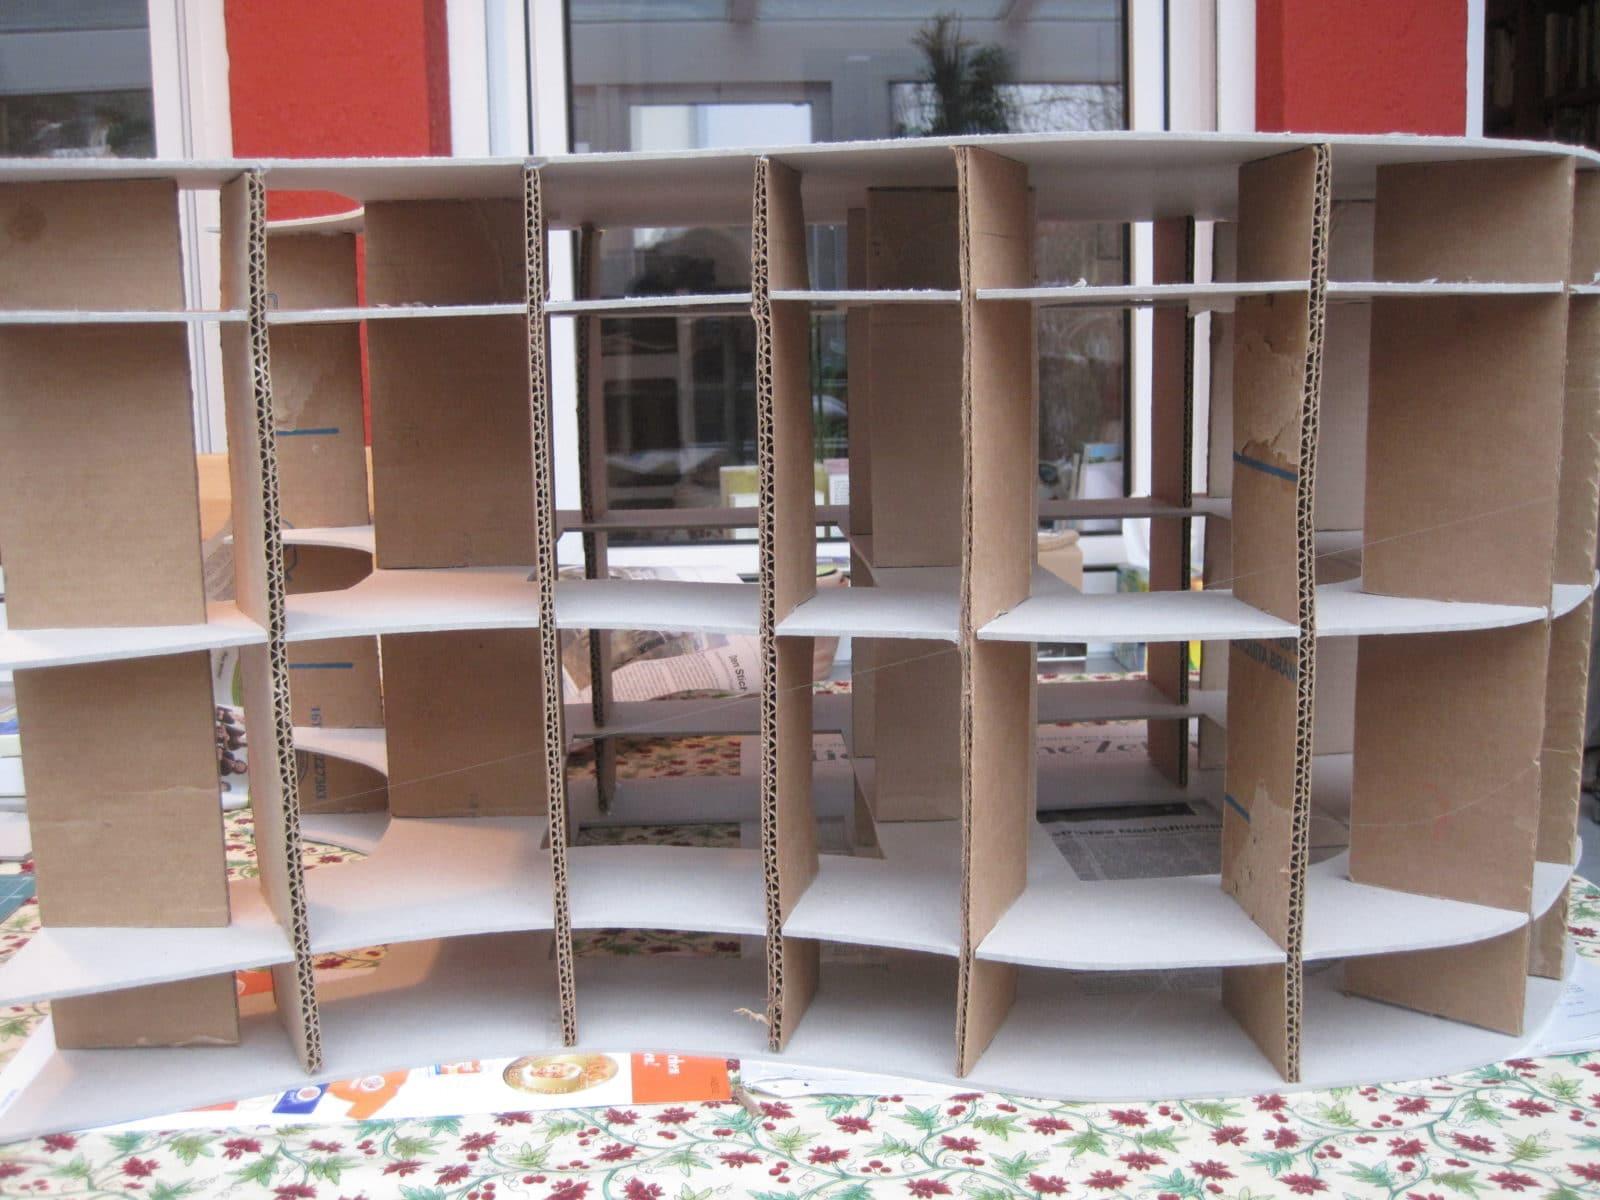 Möbel aus Pappe - Upcycling-Projekte - HANDMADE Kultur